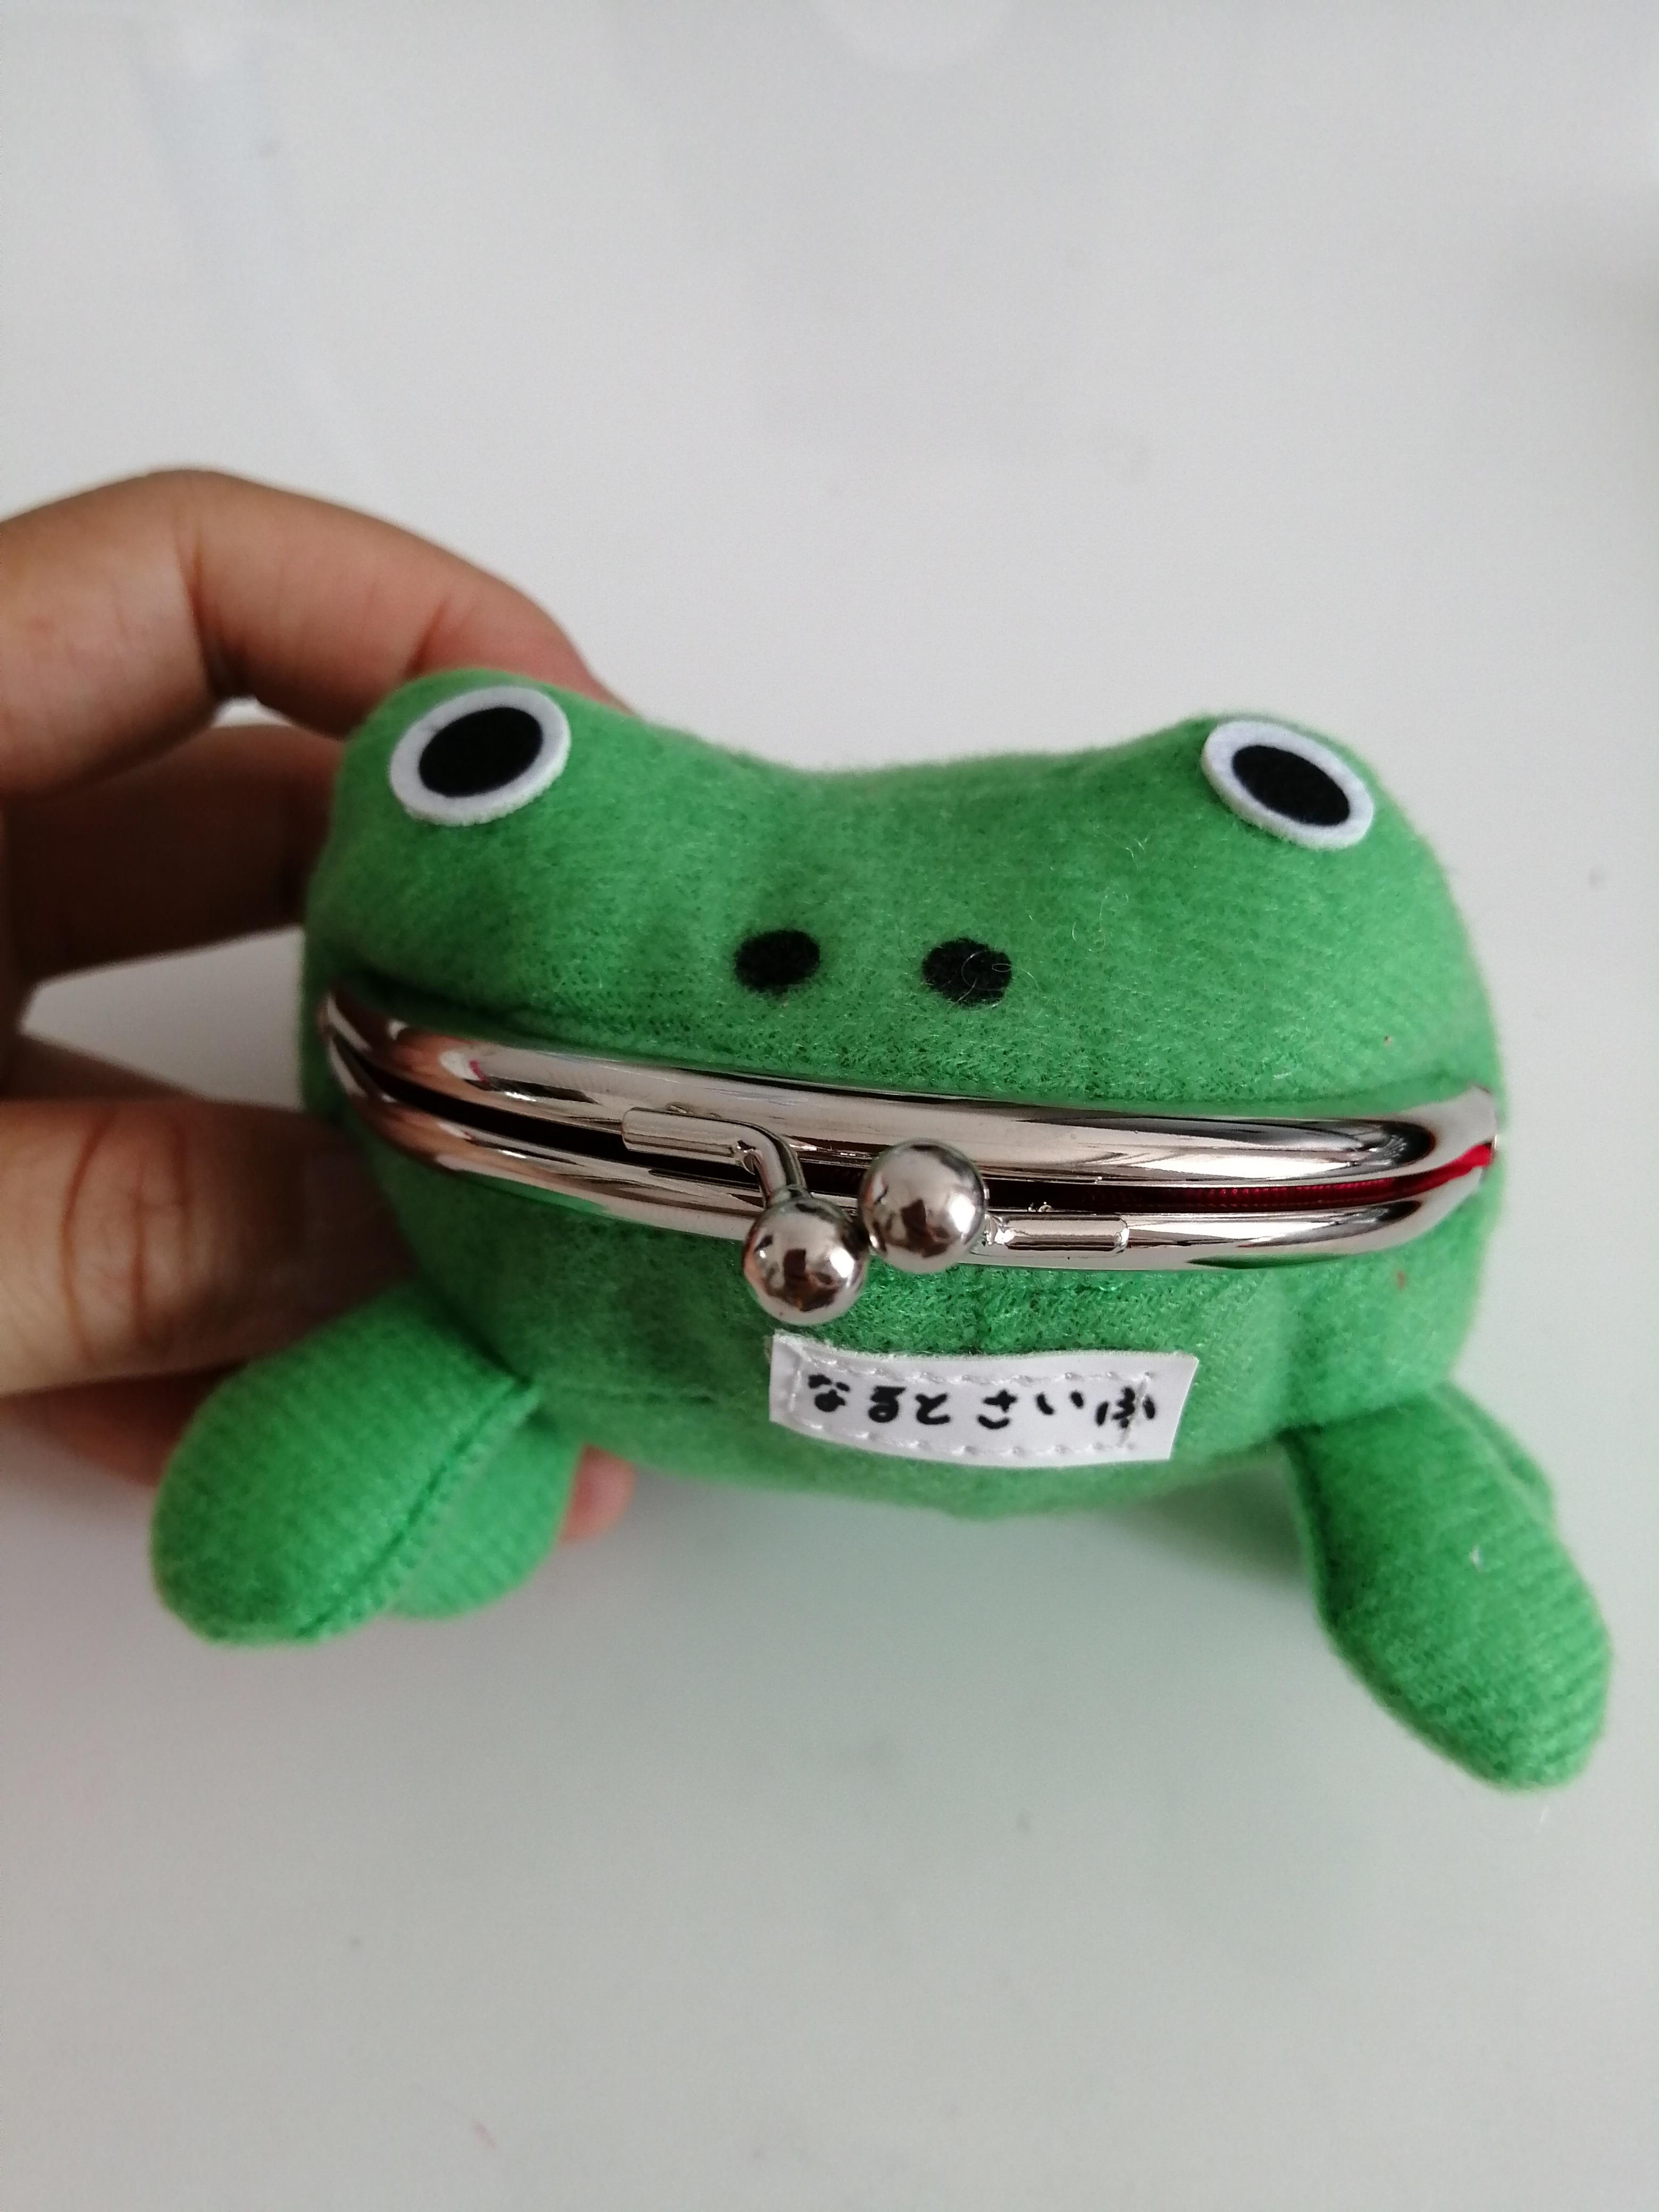 Anime Cartoon Naruto Naruto Frog Purse Wallet Coin Purse Originality Manga Flannel Wallet Cheap Cute Purse